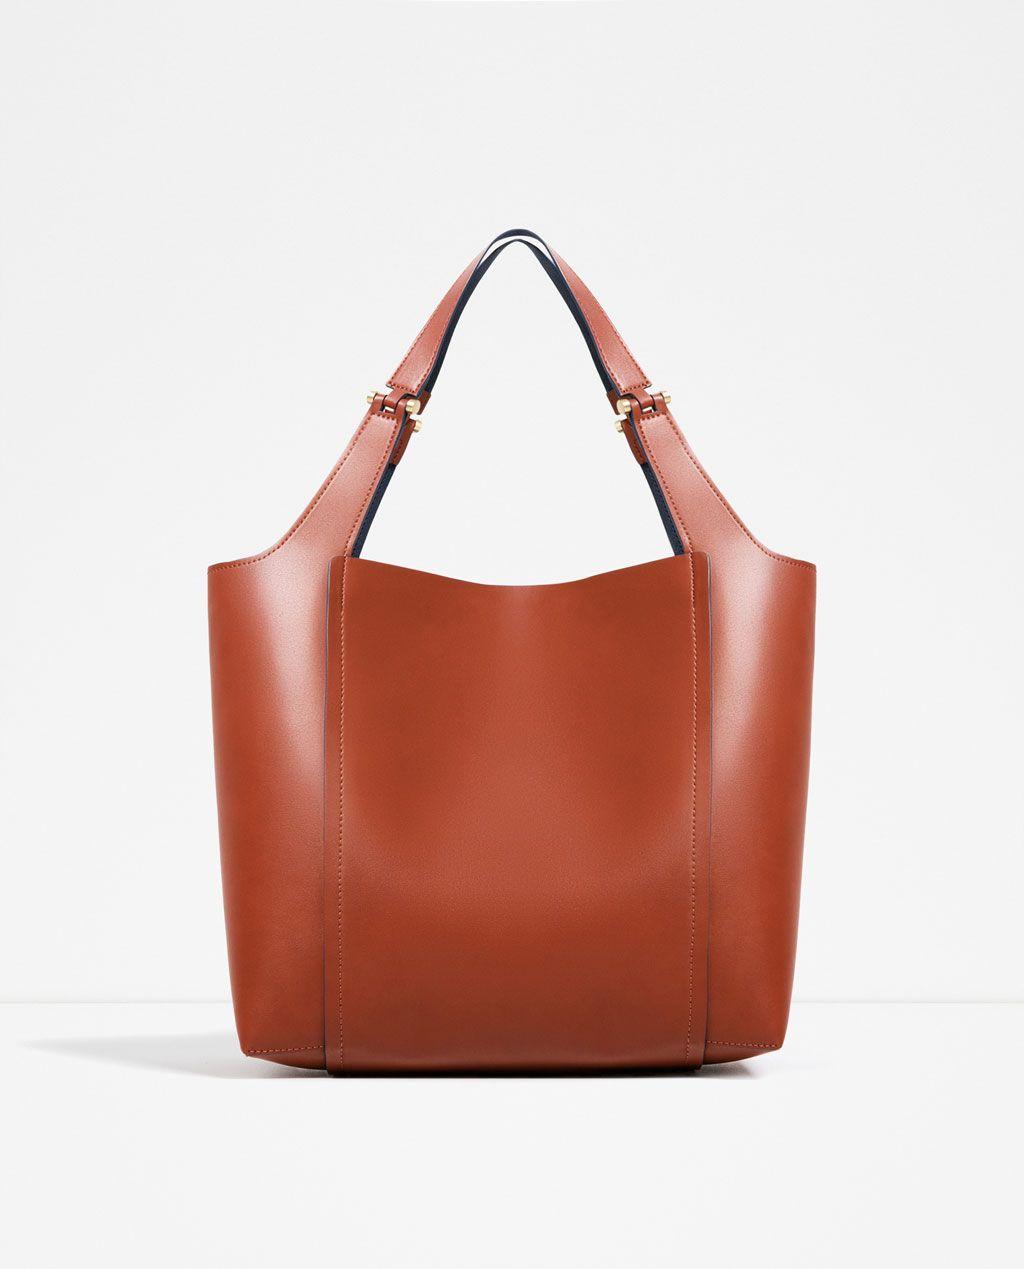 822a6dad62 Kabelka Handbags Kovovými S amp  Detaily Bags Zara Kabelky OXOq8Ux